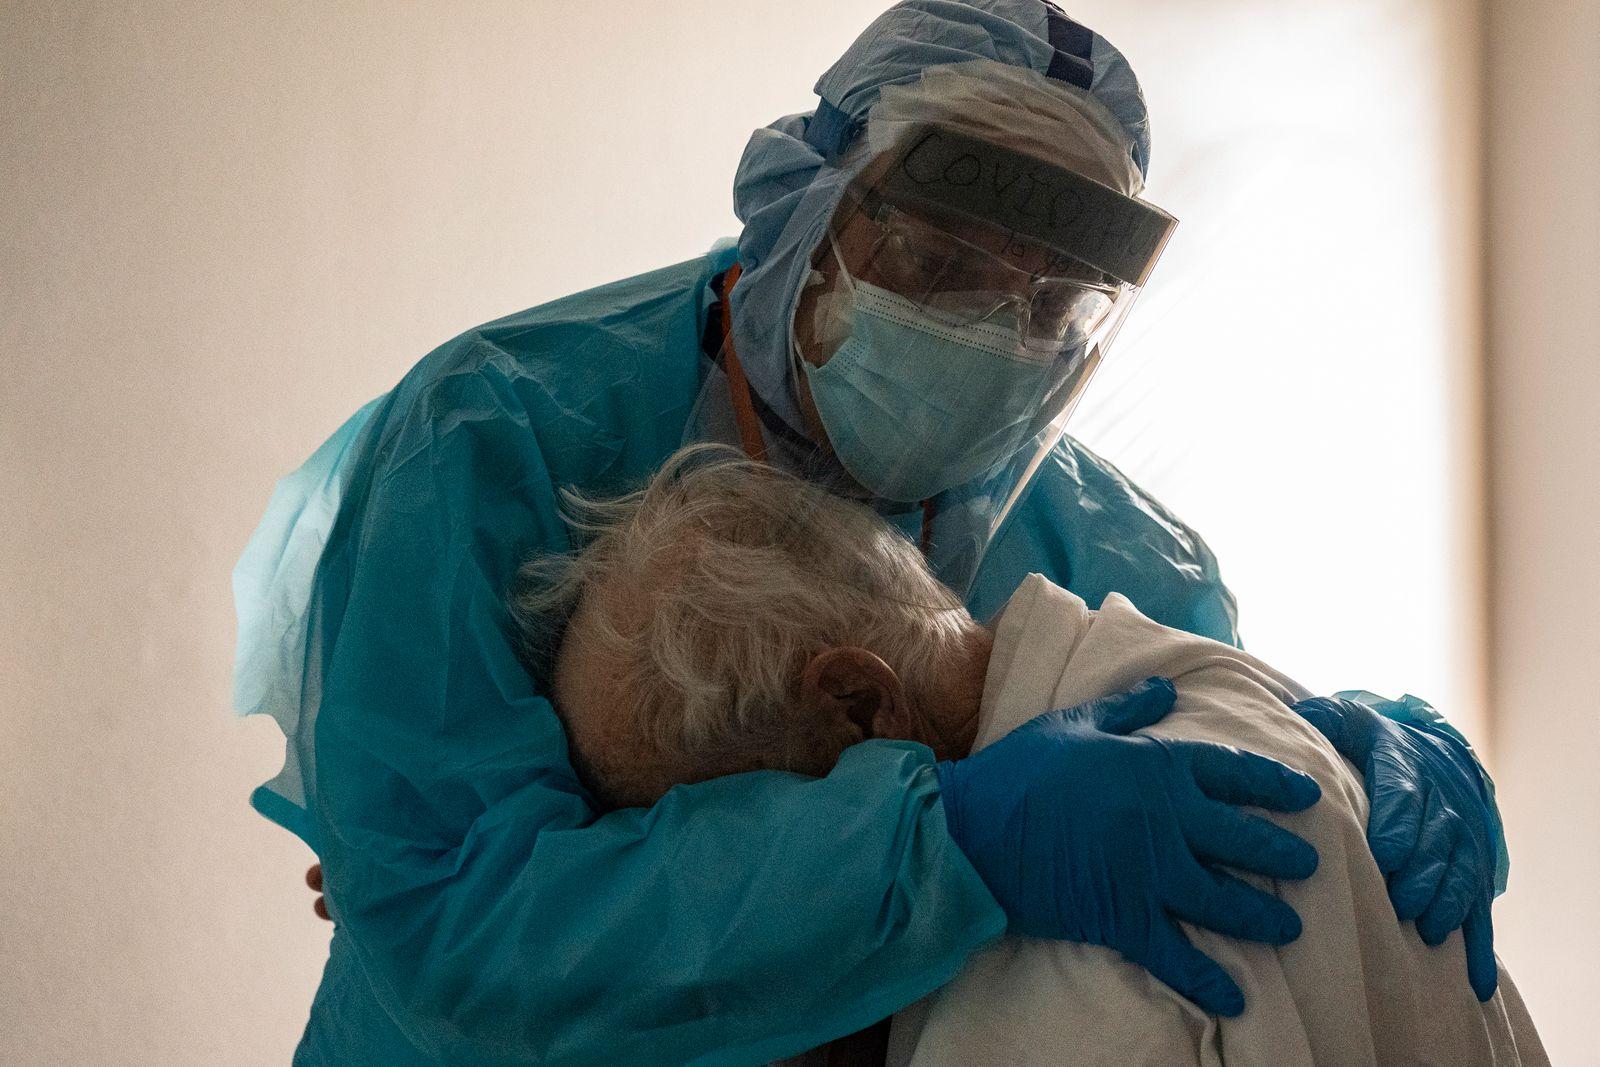 ***BESTPIX*** Houston Hospital Staff Works In COVID ICU On Thanksgiving